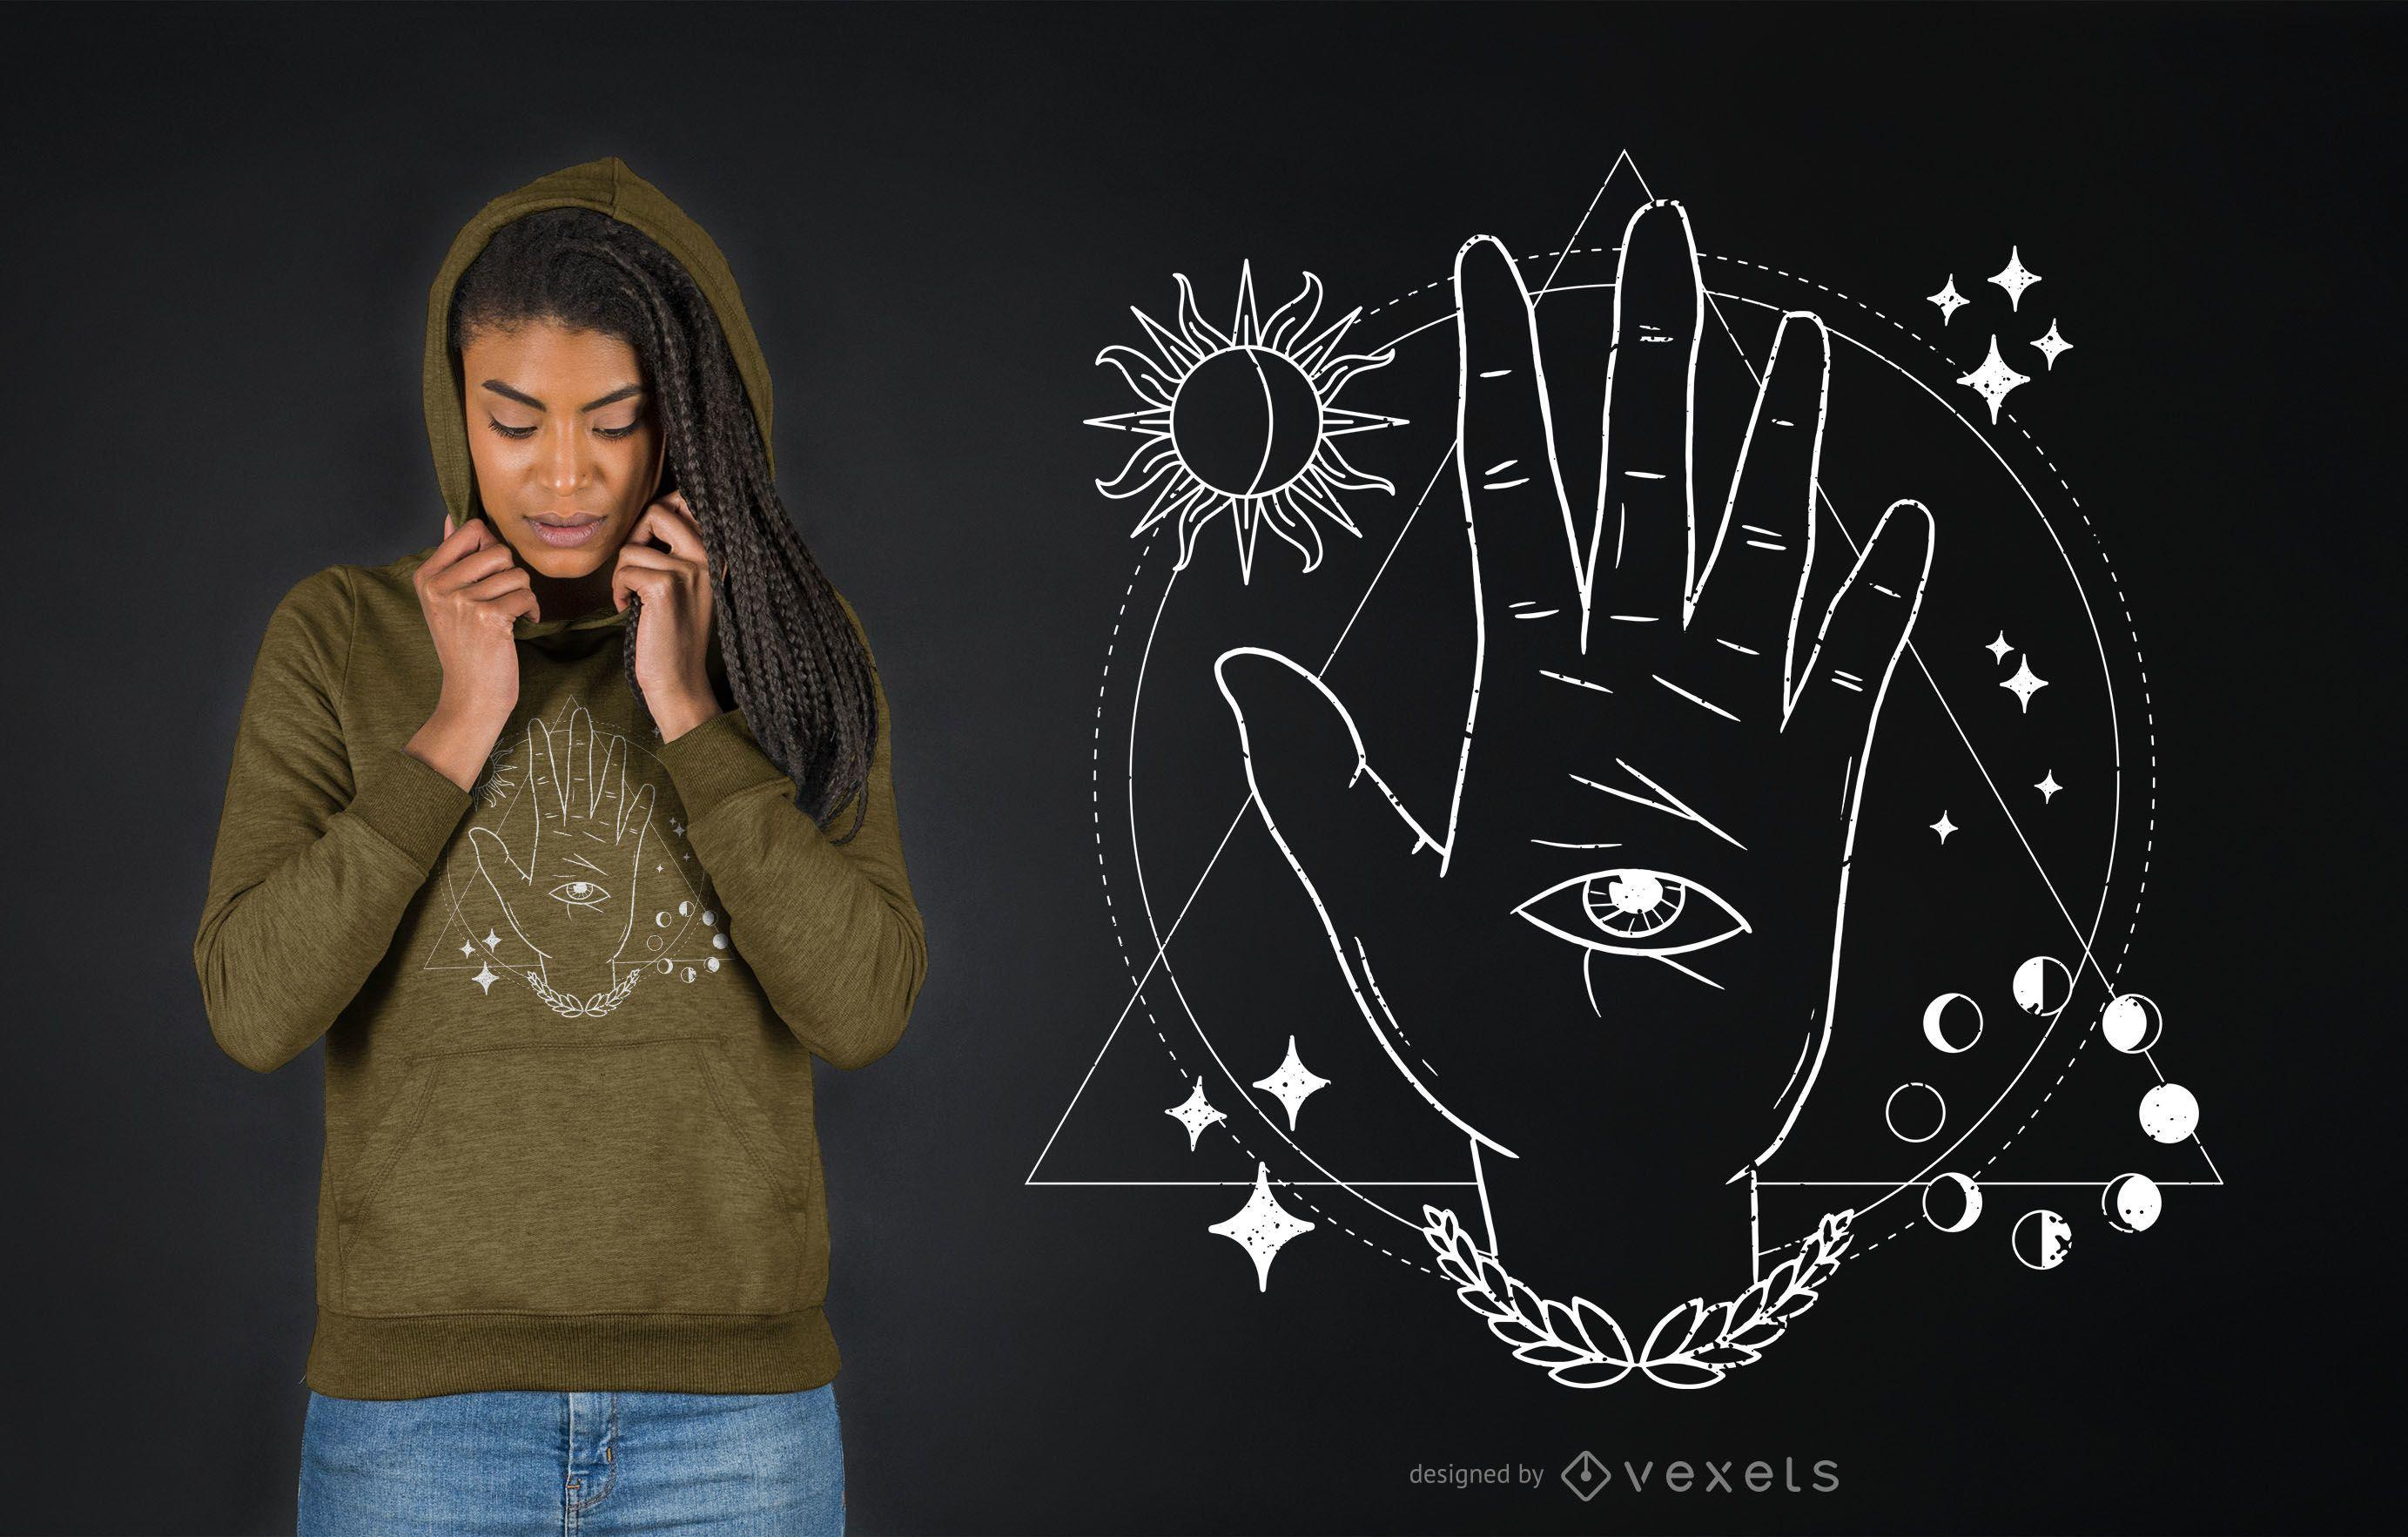 Dise?o de camiseta Mystical Hand Eye